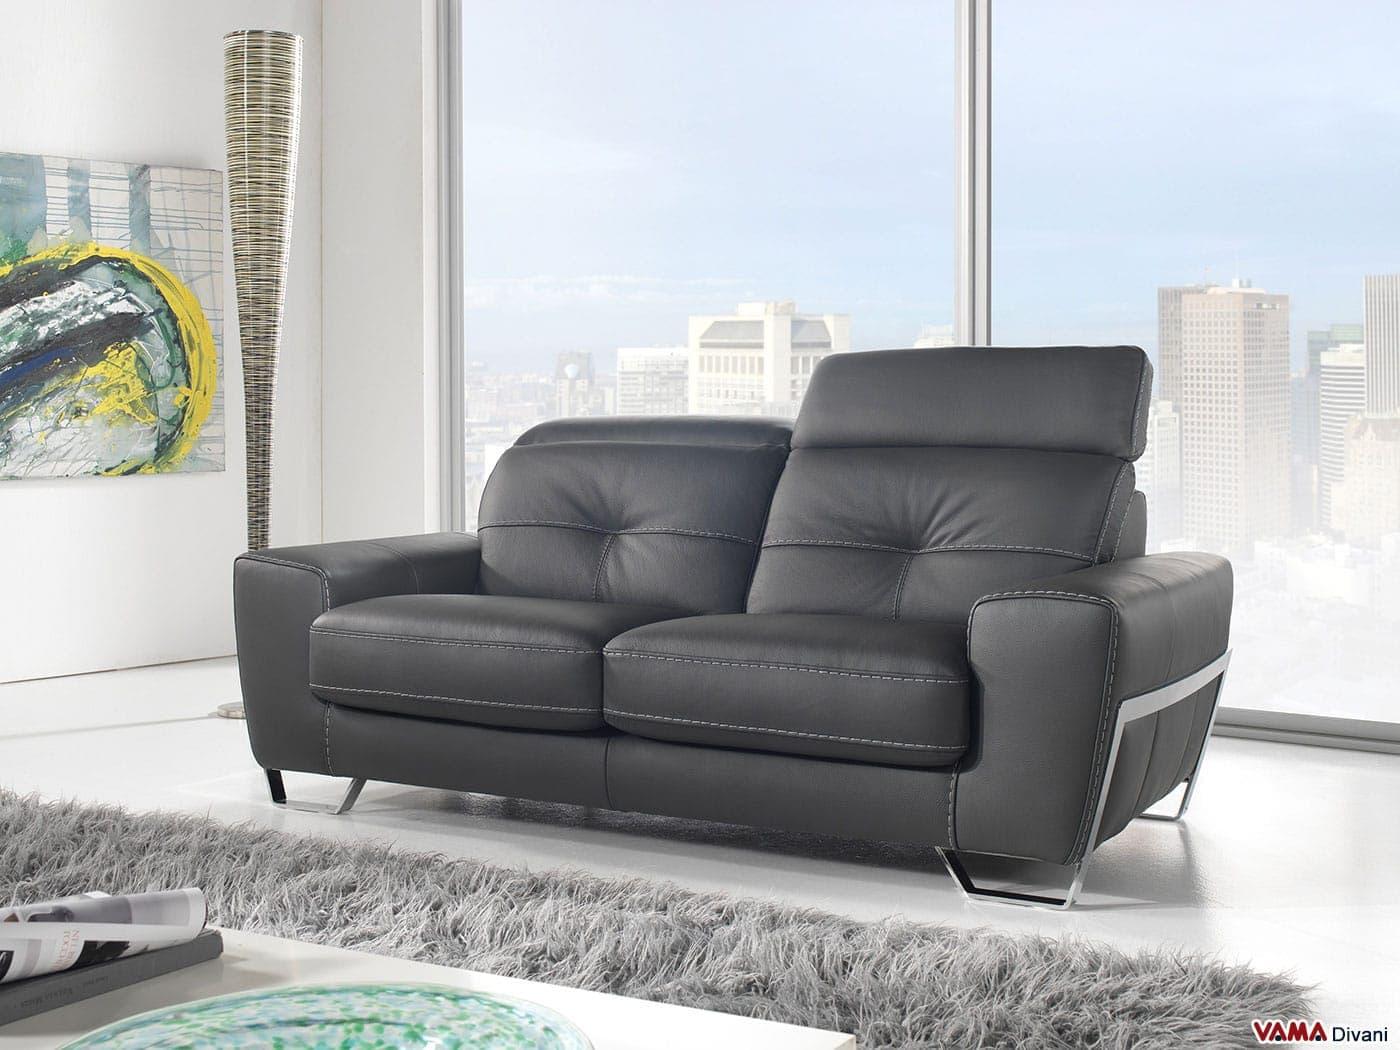 Divano ecopelle mondo convenienza simple mondo - Materassi per divano letto mondo convenienza ...